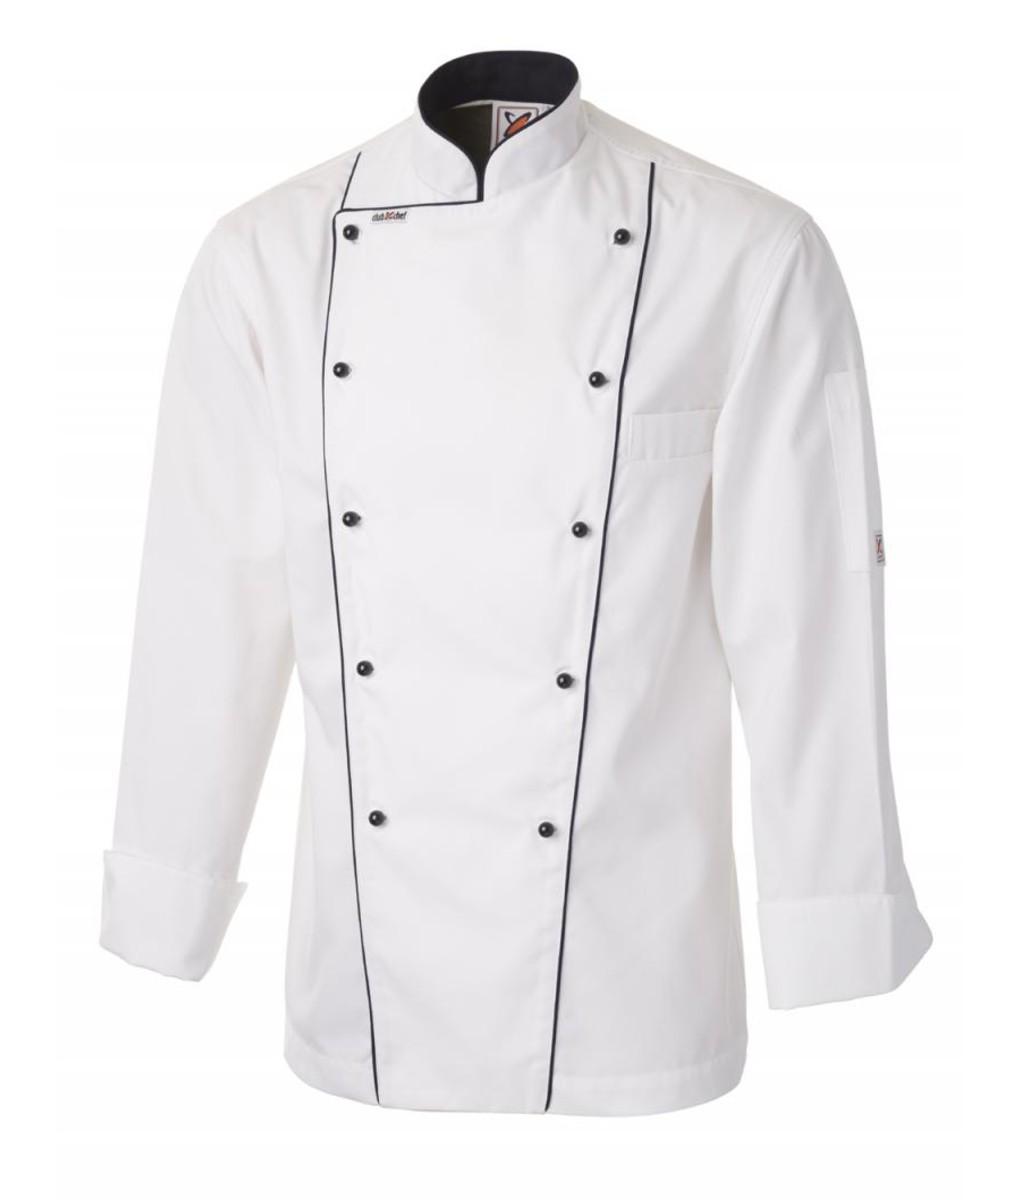 Master Chef Jacket by Club Chef